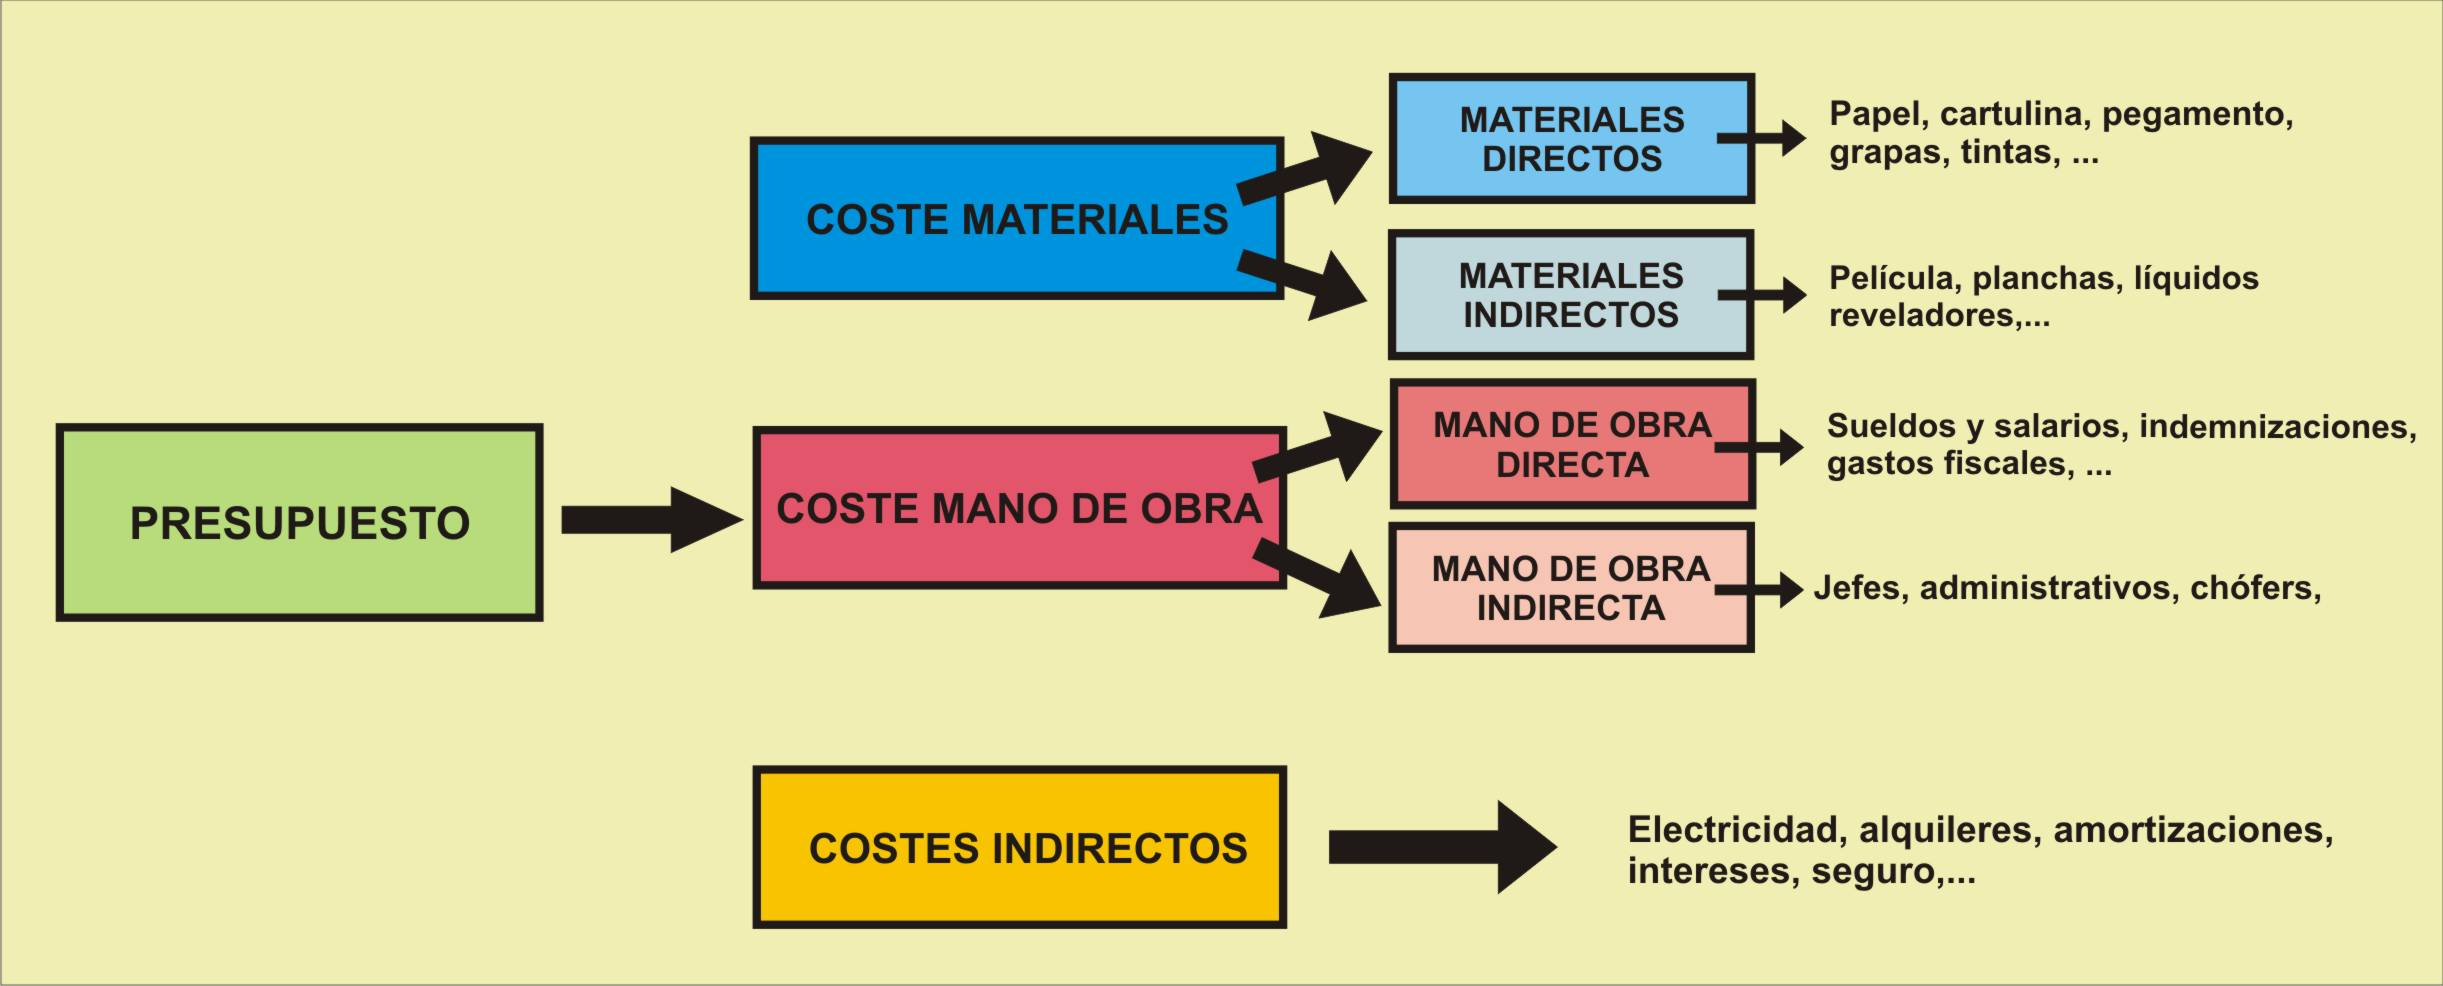 Cálculo costes producción imprenta